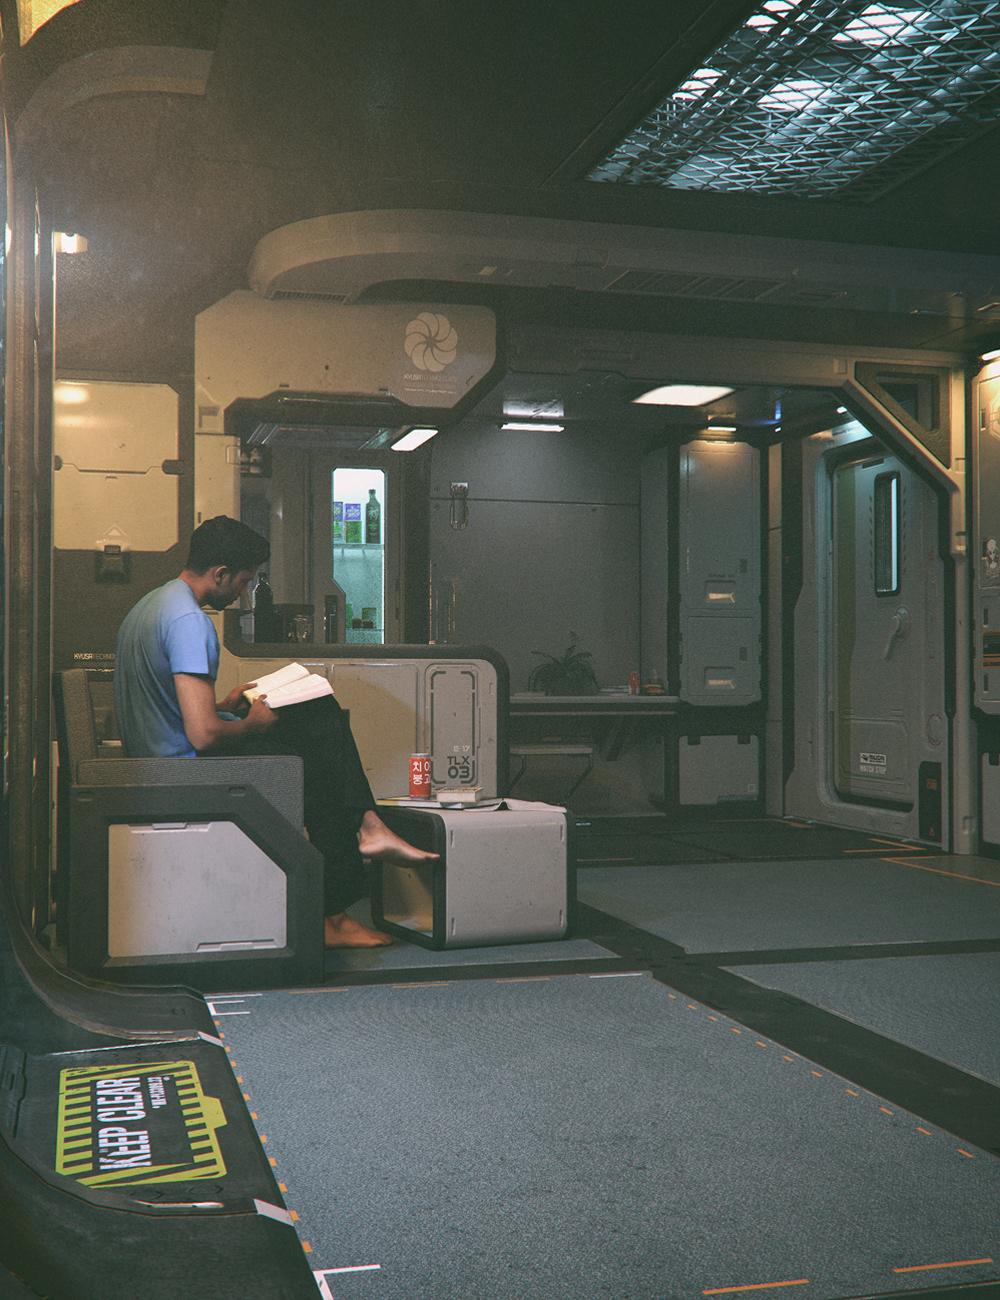 HAB - Sci-Fi Living Quarters by: Stonemason, 3D Models by Daz 3D